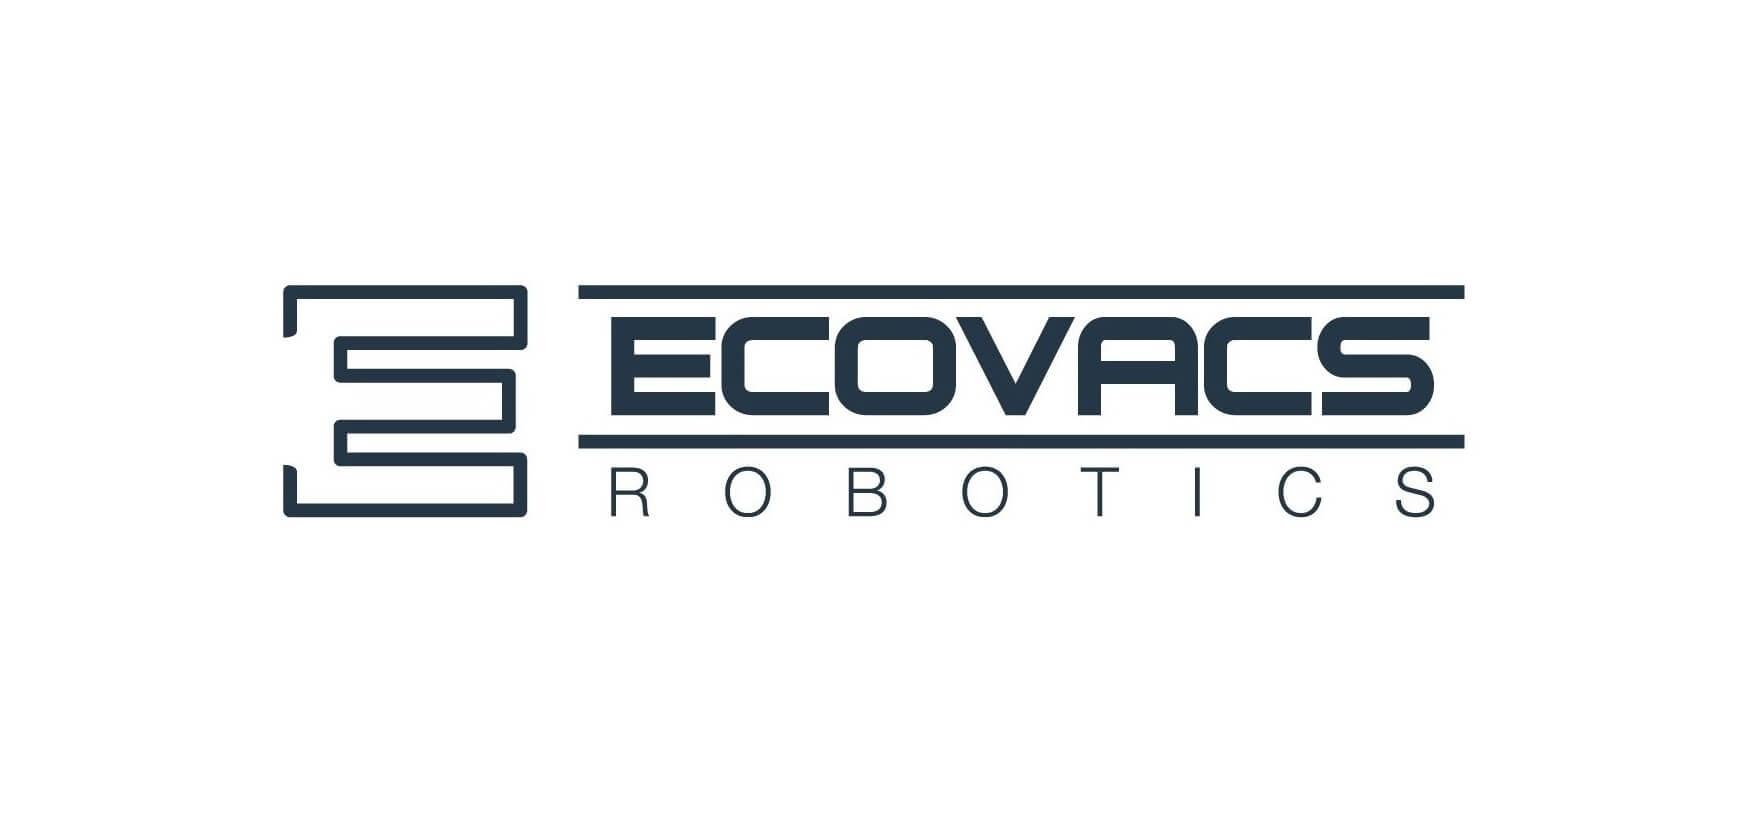 deebot ecovacs logo